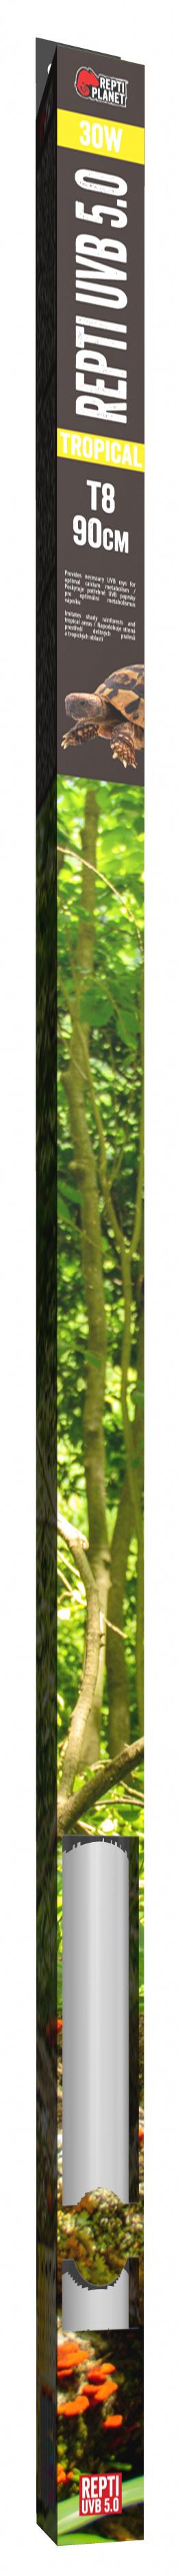 Spuldze terārija lampai - ReptiPlanet Repti T8 UVB 5.0 30W, 90 cm